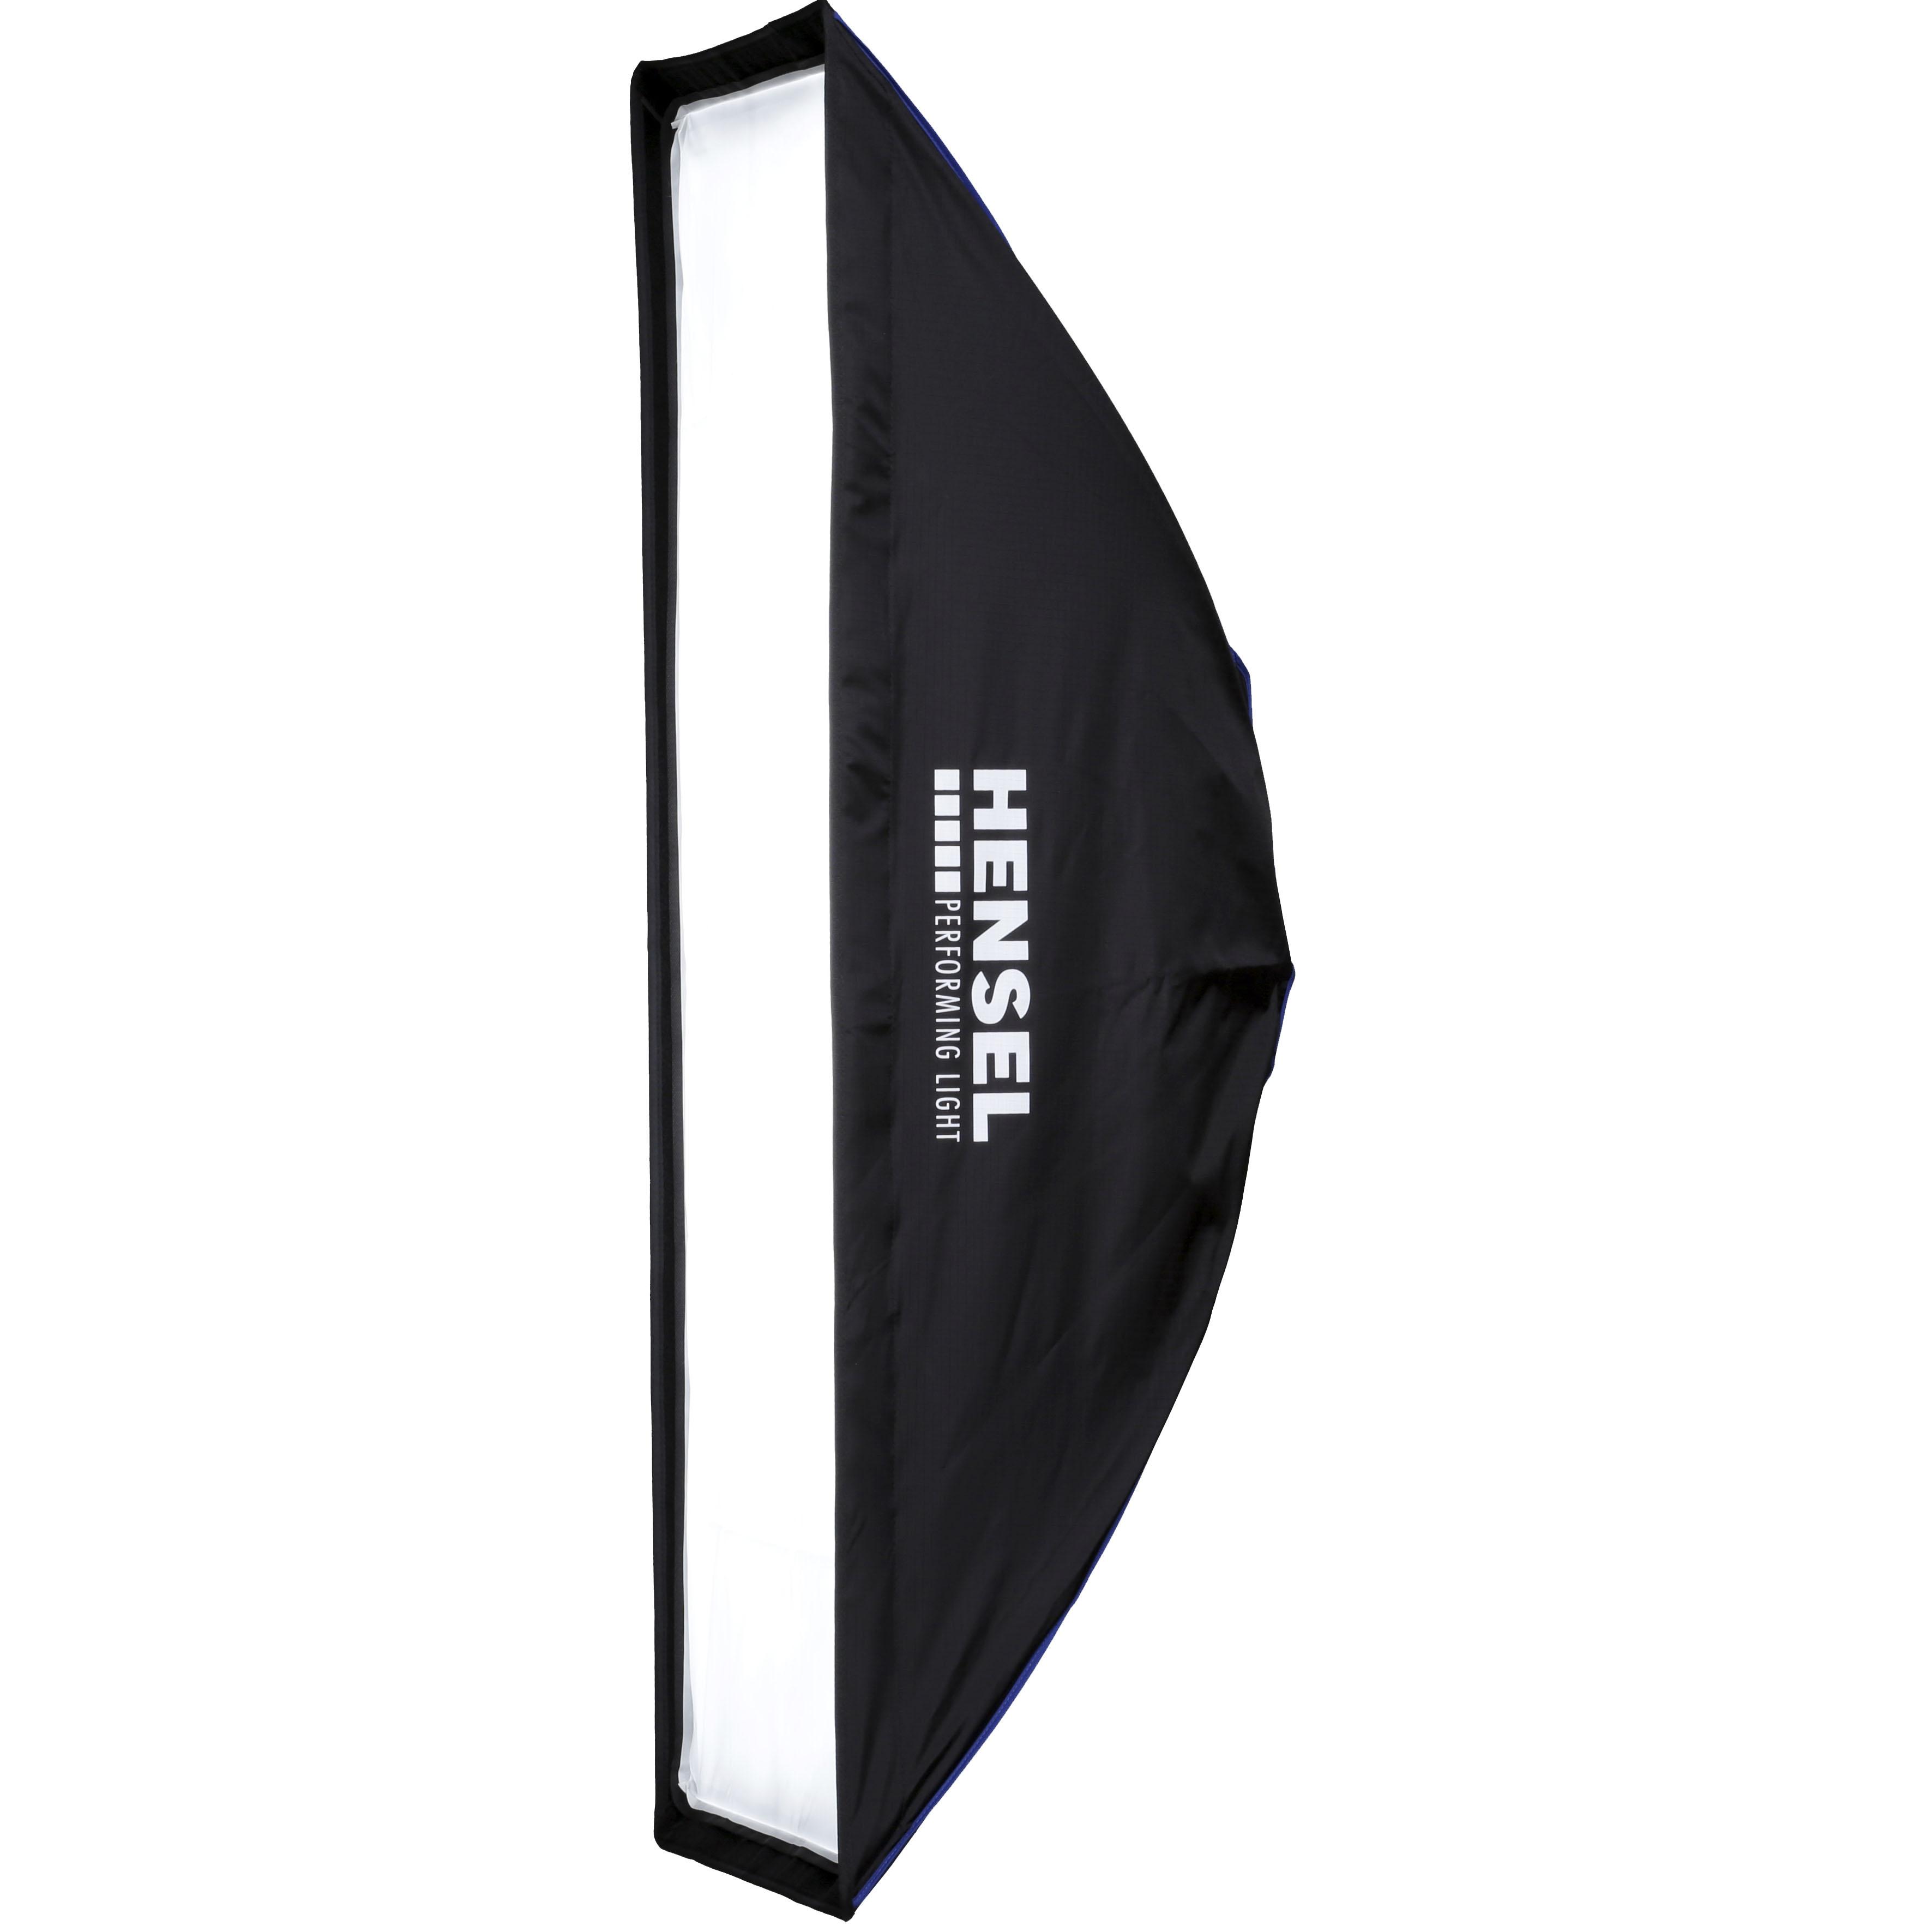 HENSEL Softbox E 80 x 100 cm by Digitale Fotografien